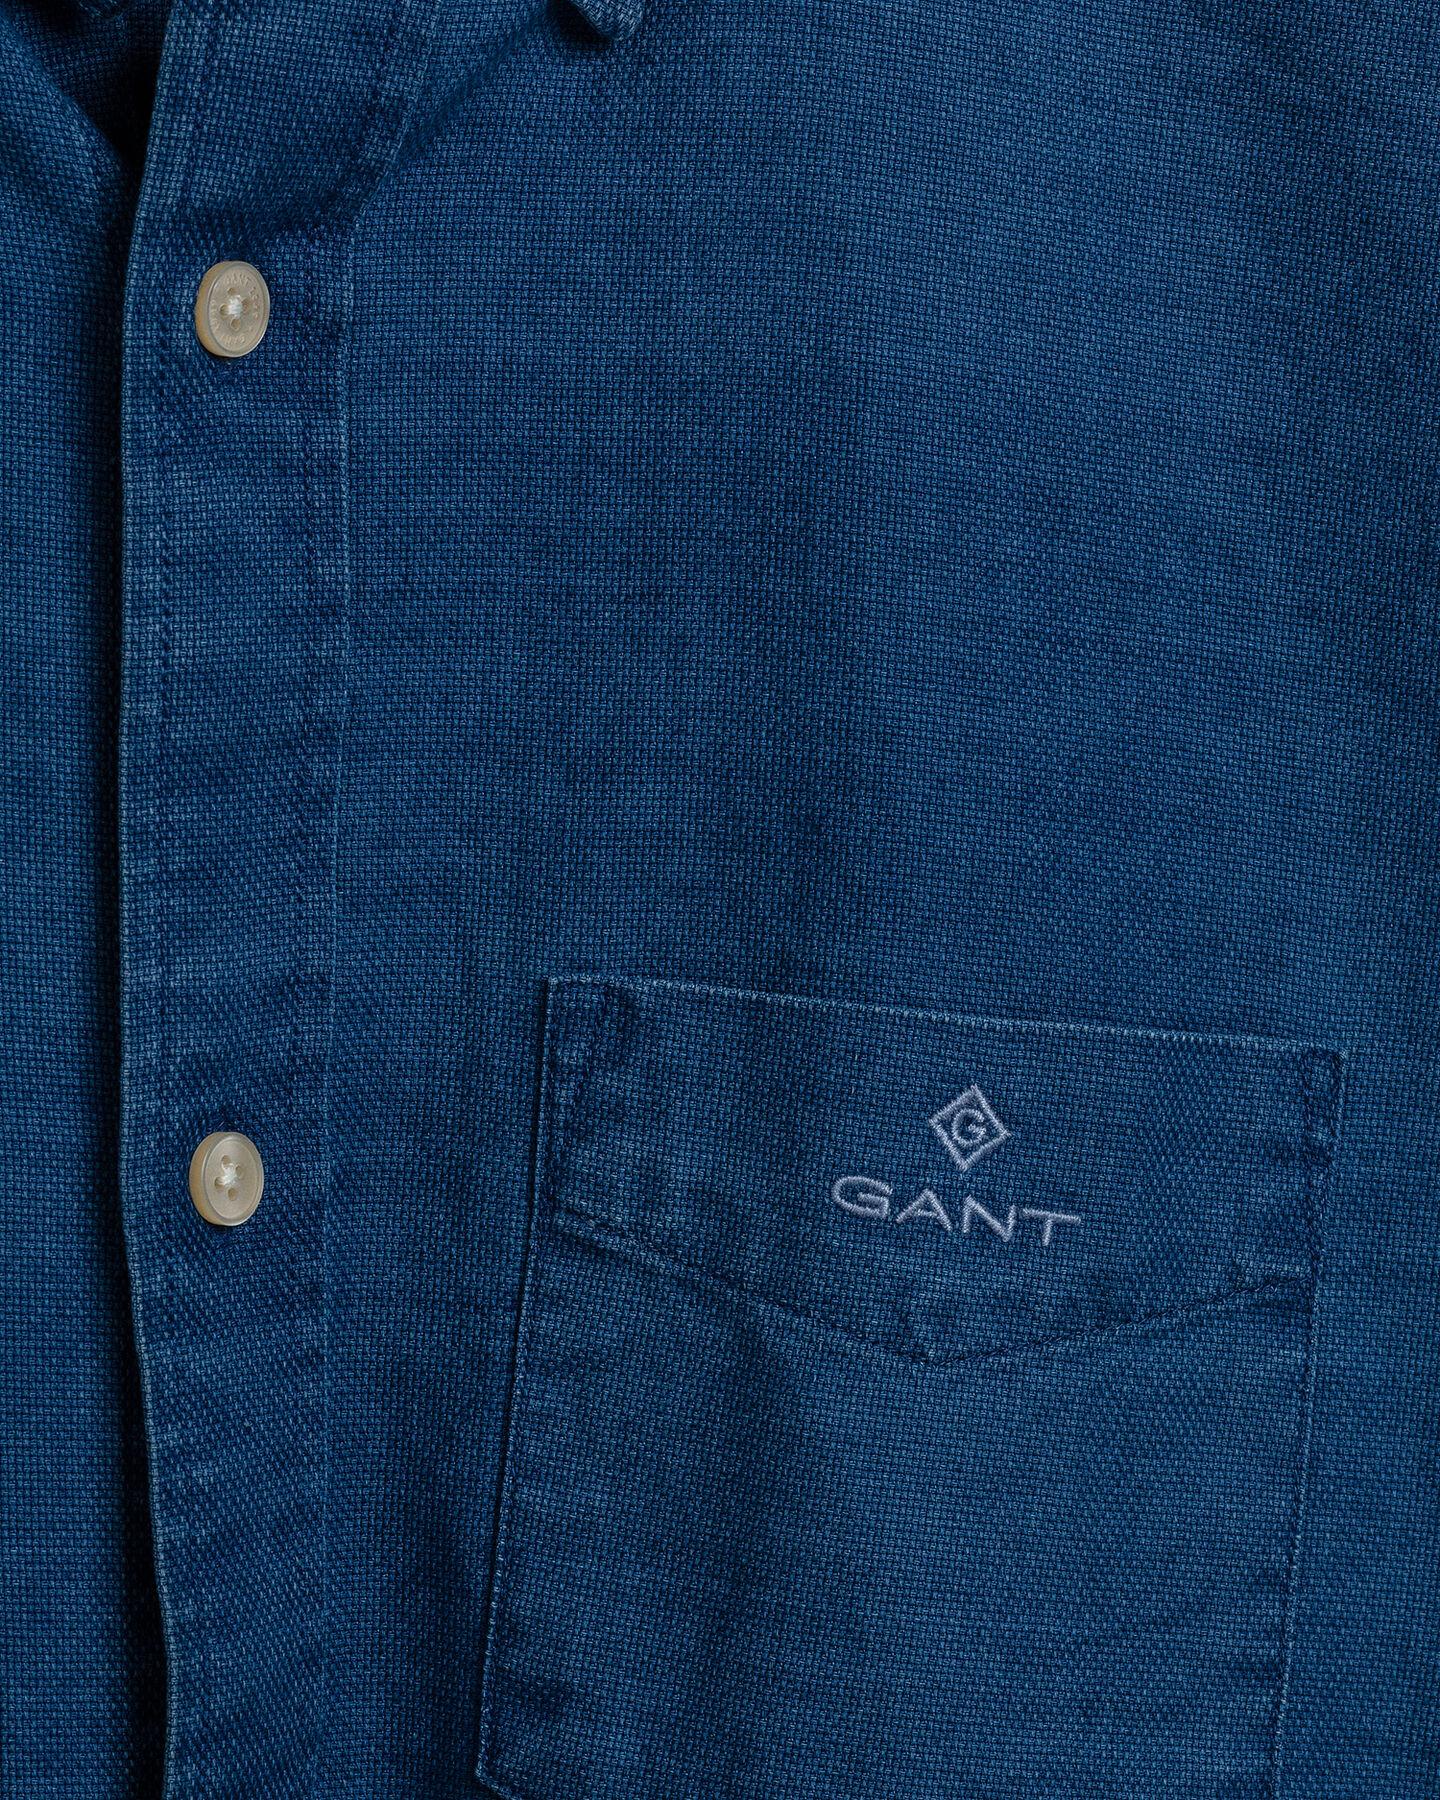 Indigoblaues Royal Regular Fit Oxford-Hemd